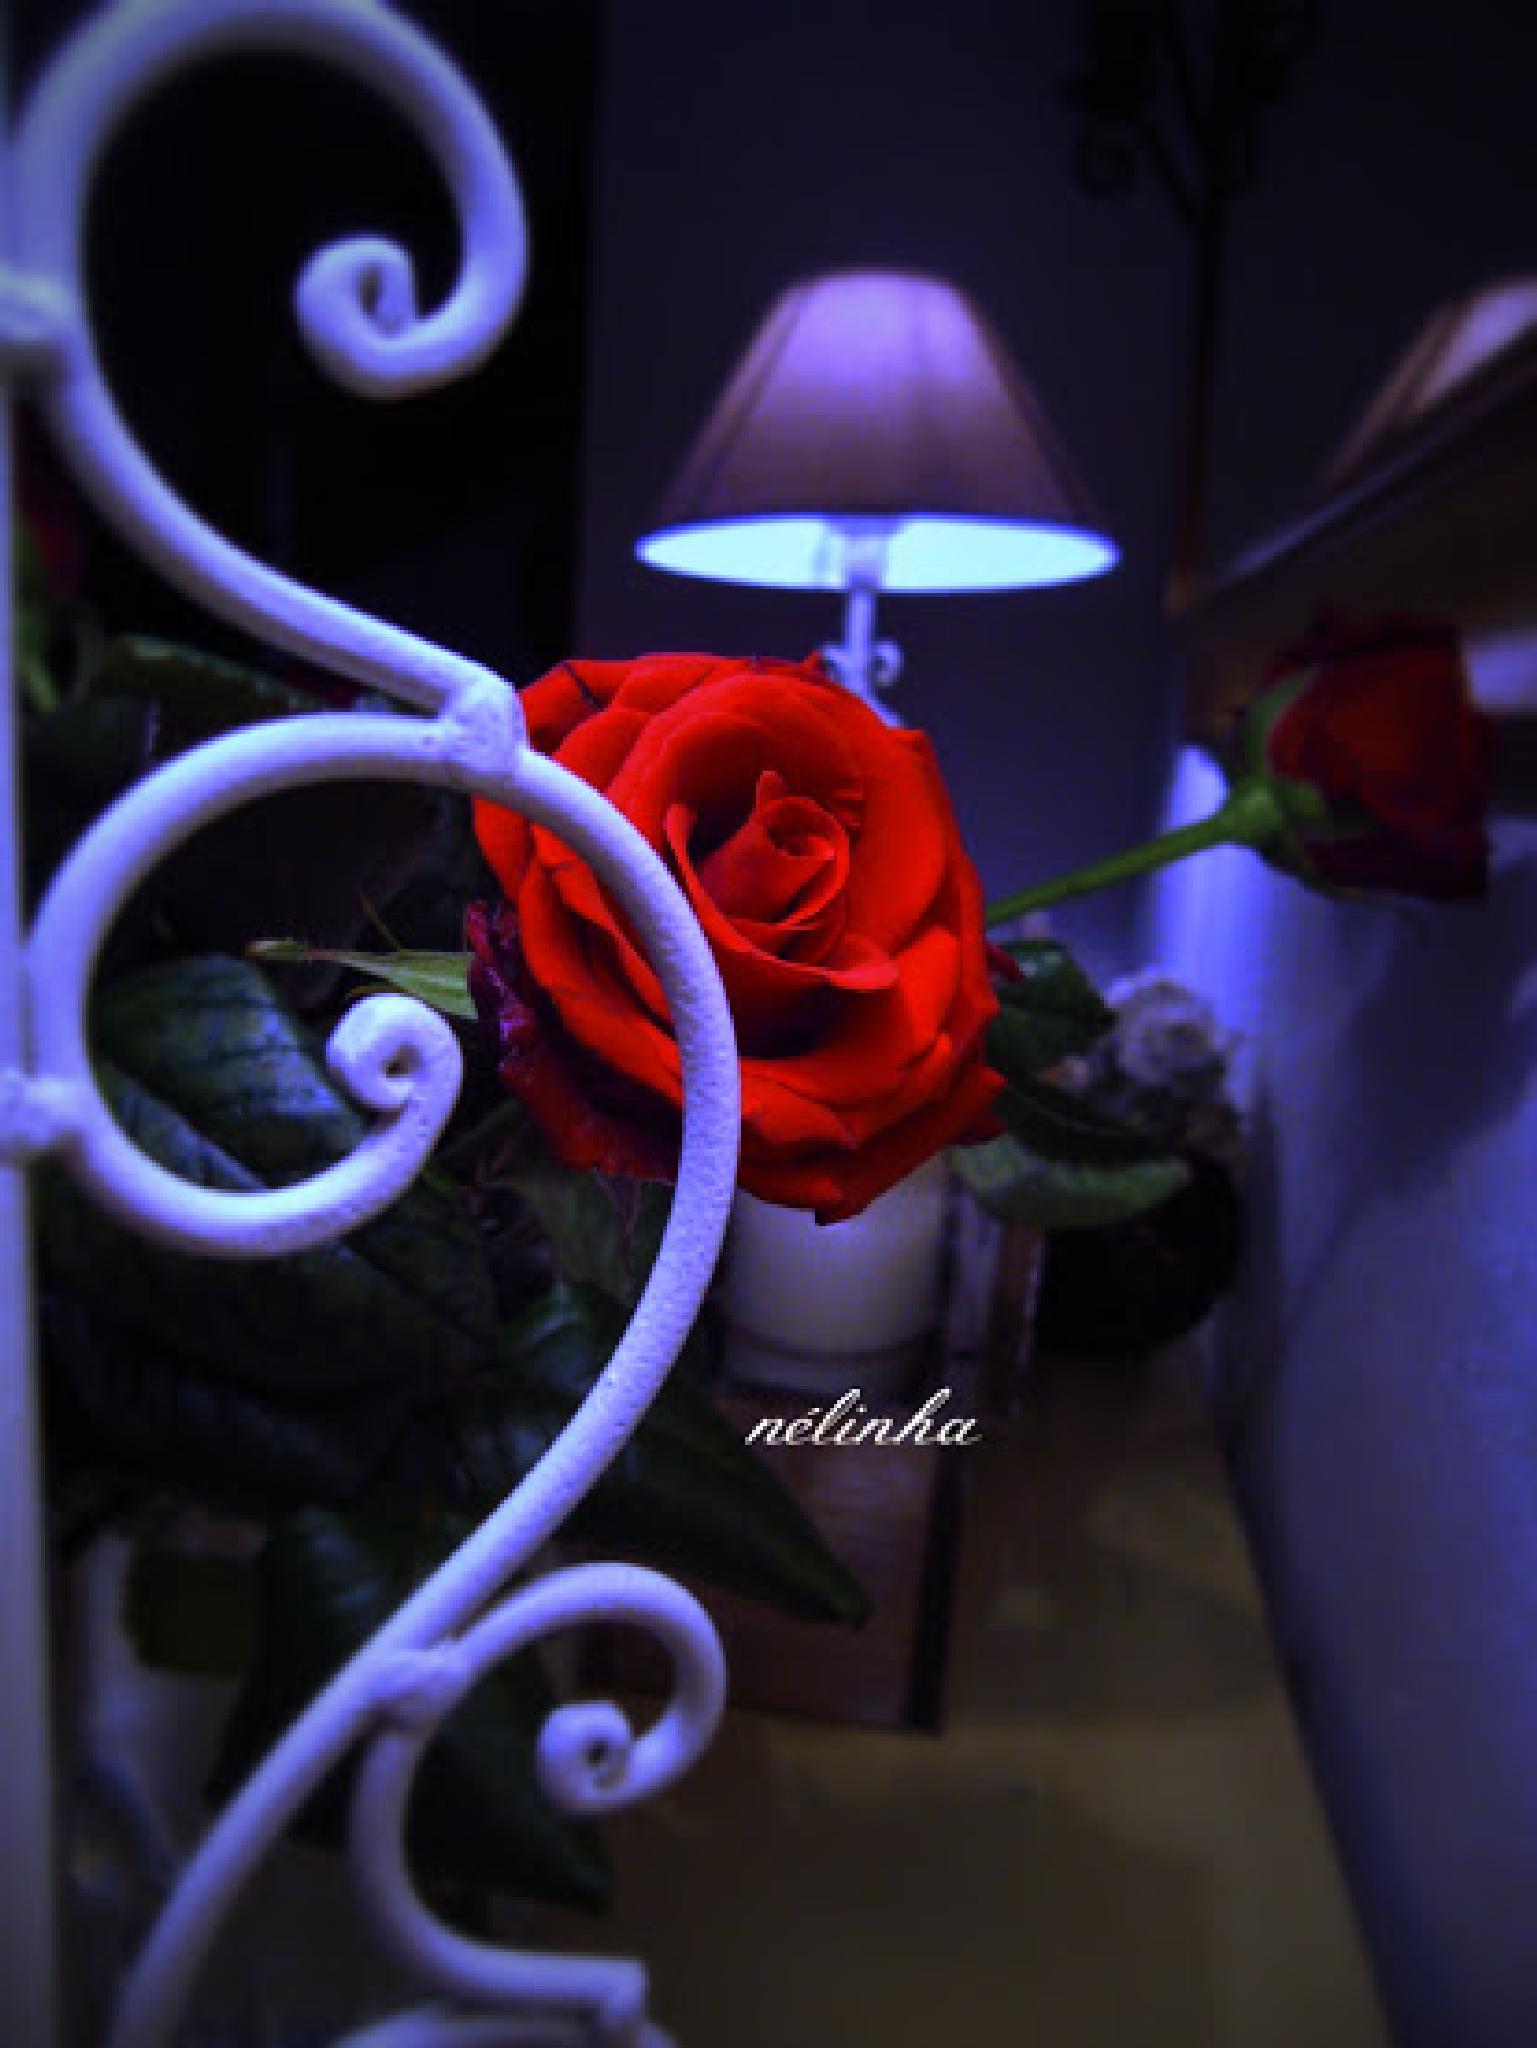 Roses..... by Nélinha